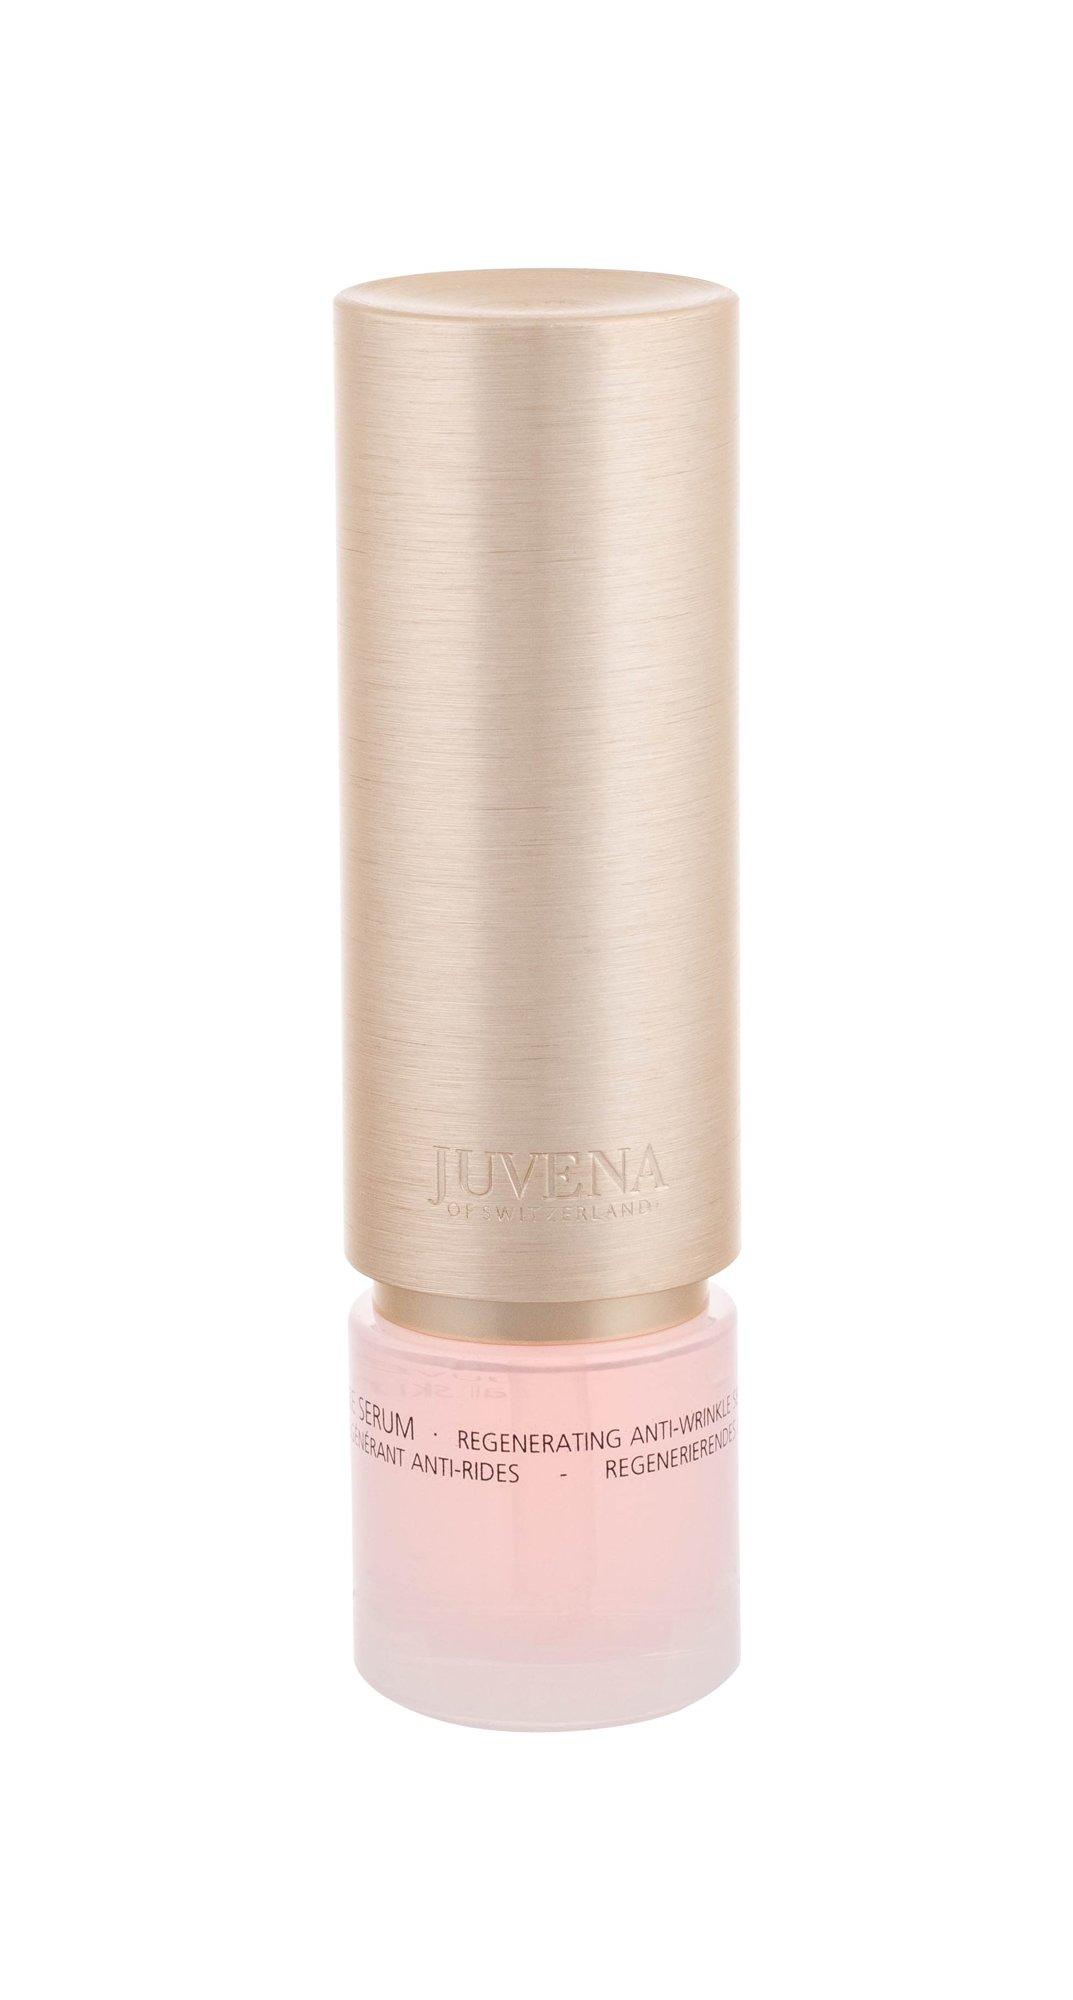 Juvena Juvelia Skin Serum 30ml  Nutri-Restore